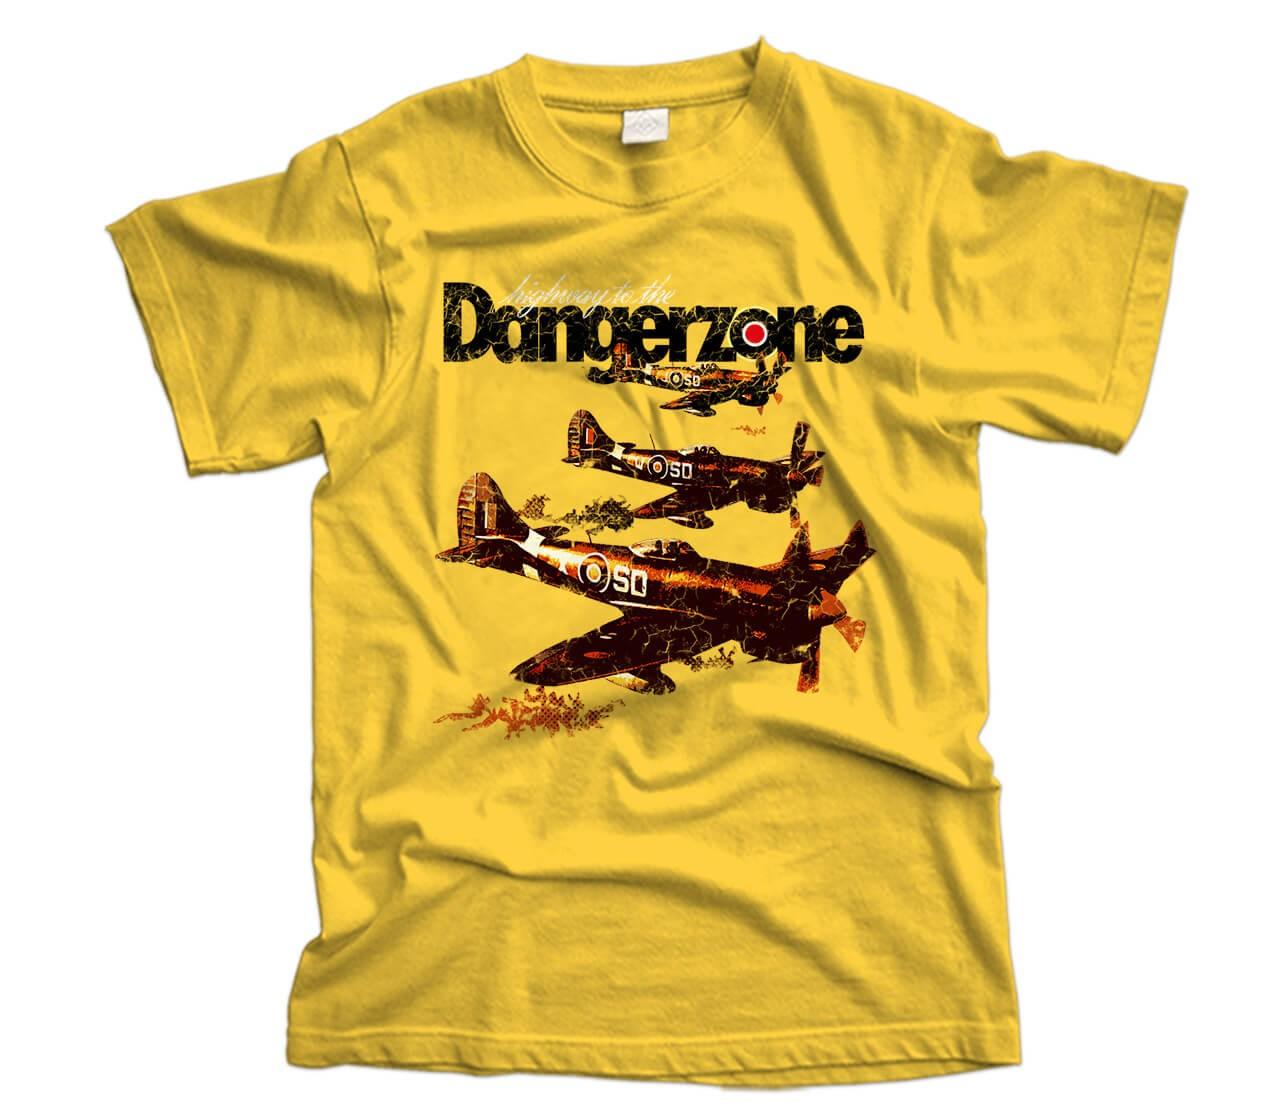 Tempest Dangerzone Aircraft T-Shirt